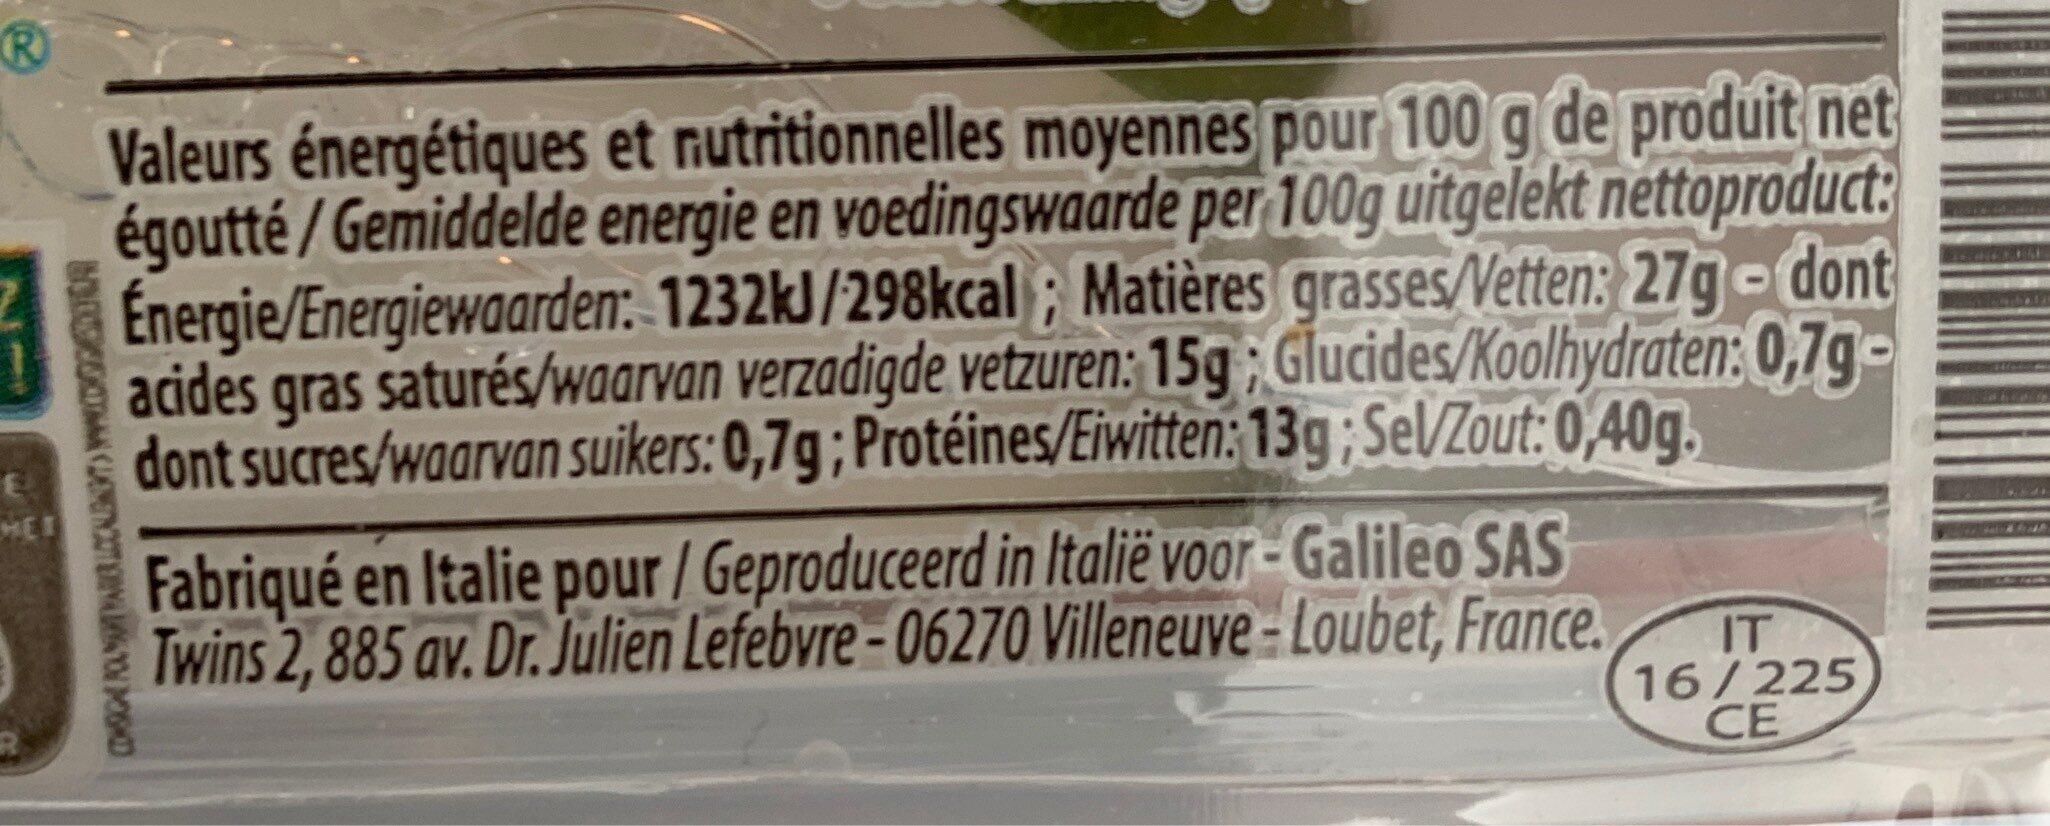 Mozzarella Burrata - Informations nutritionnelles - fr